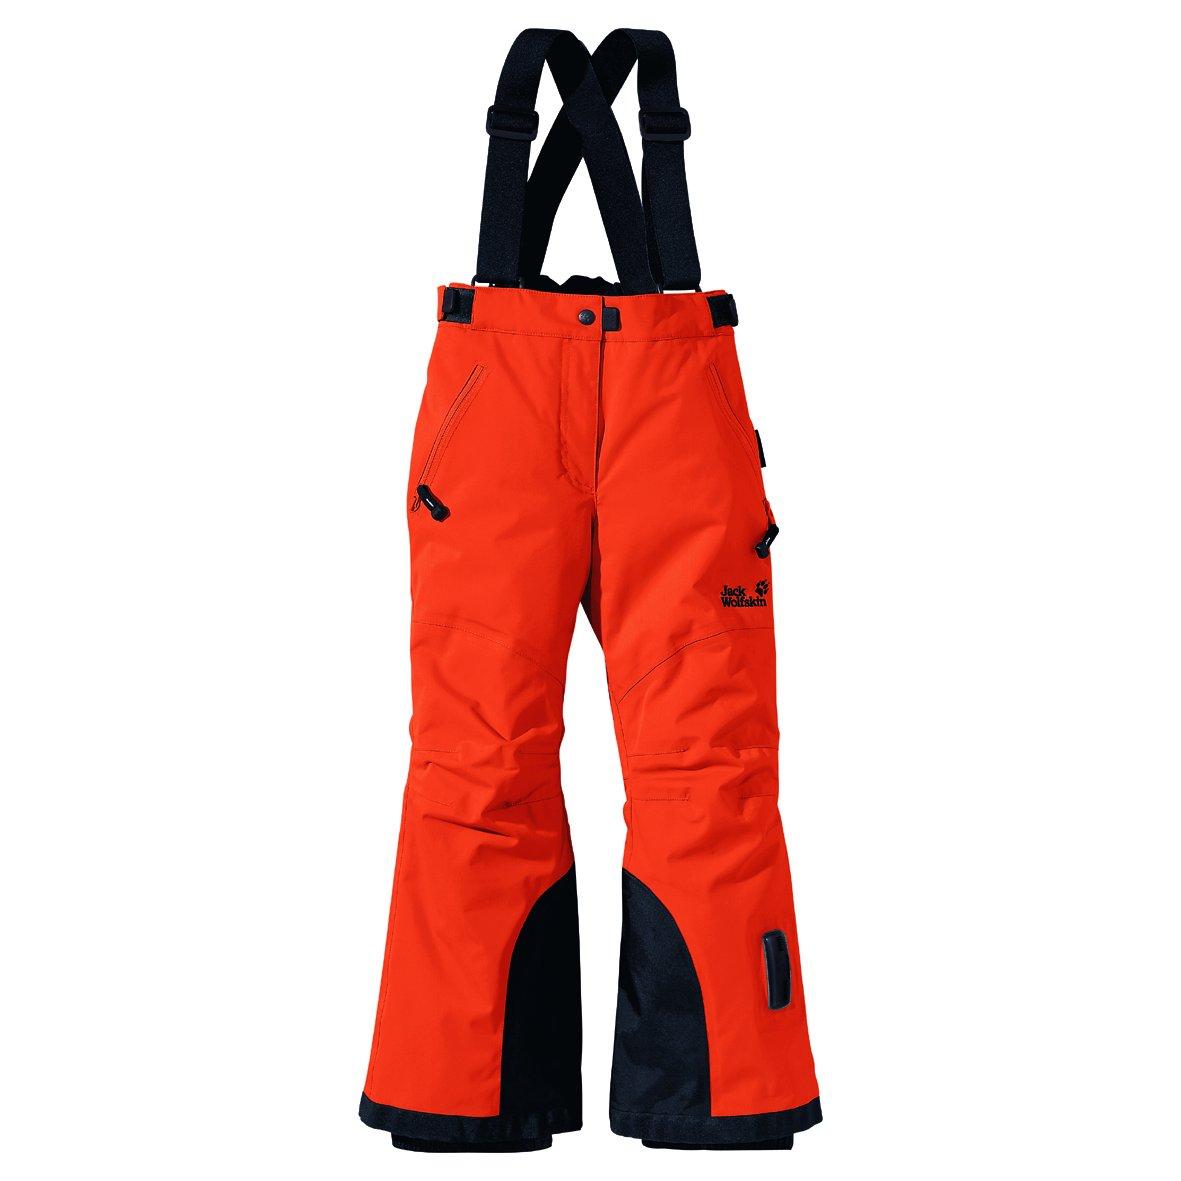 Jack Wolfskin Kids Ski Pants